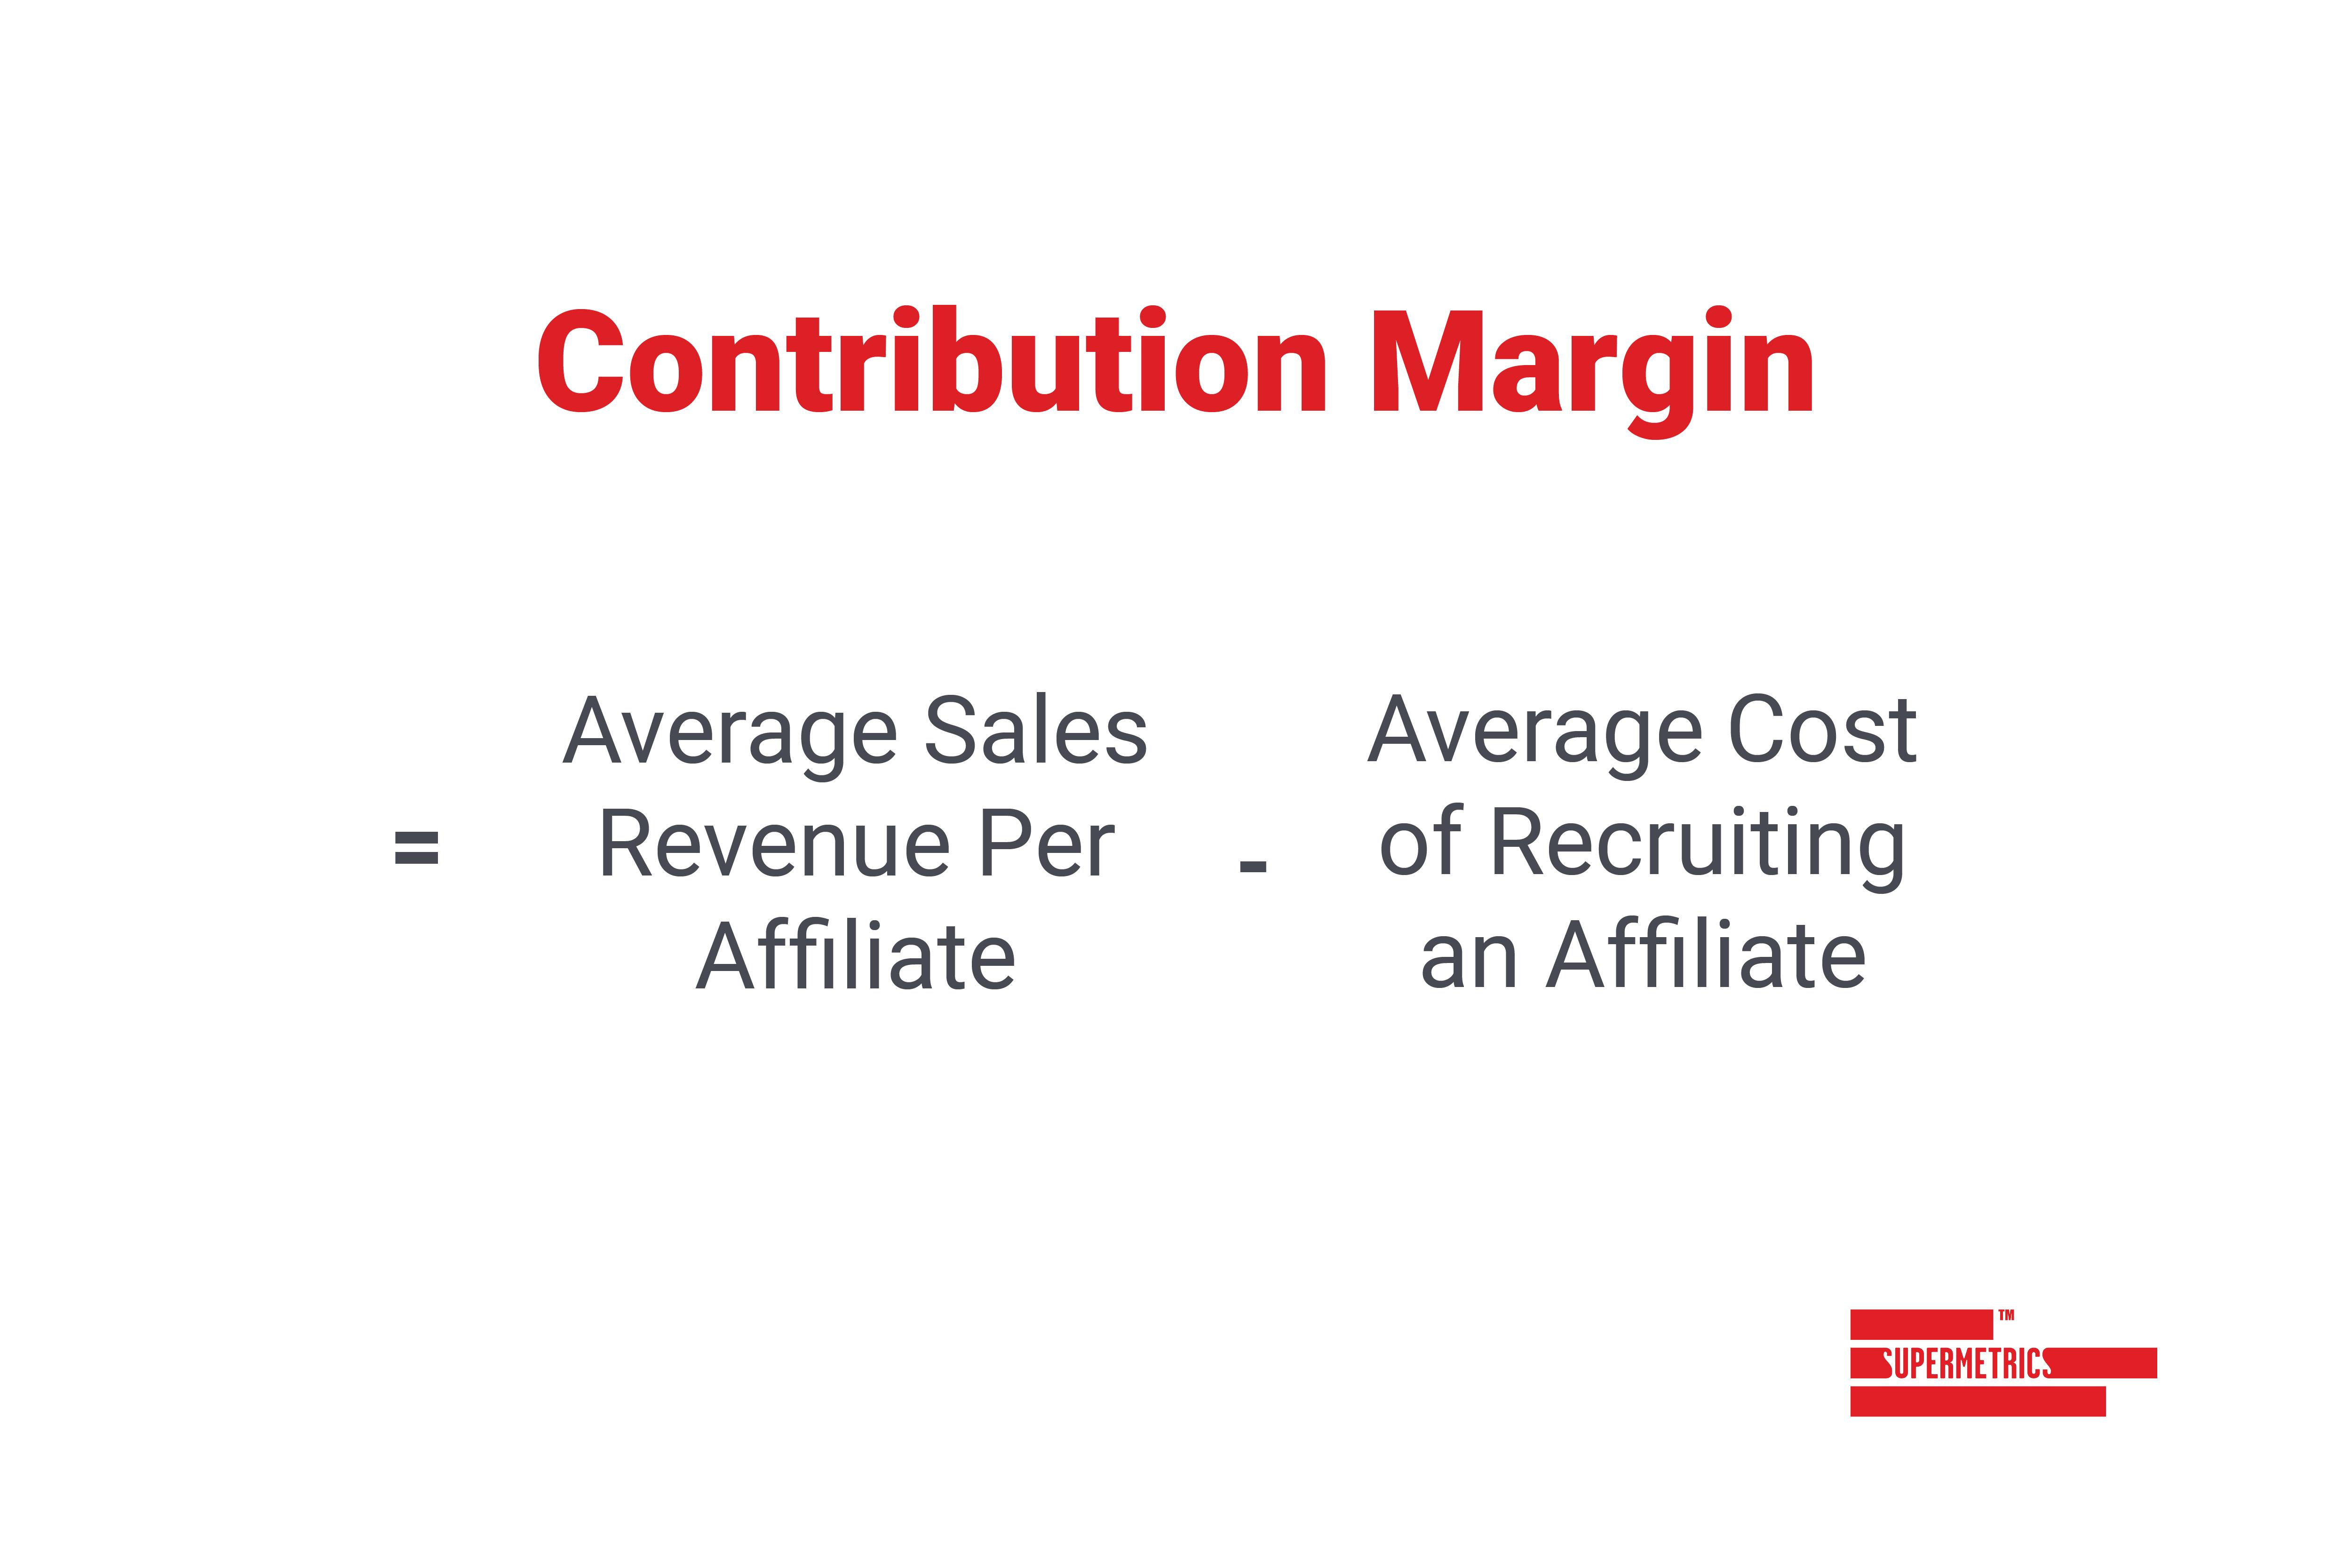 formula for contribution margin